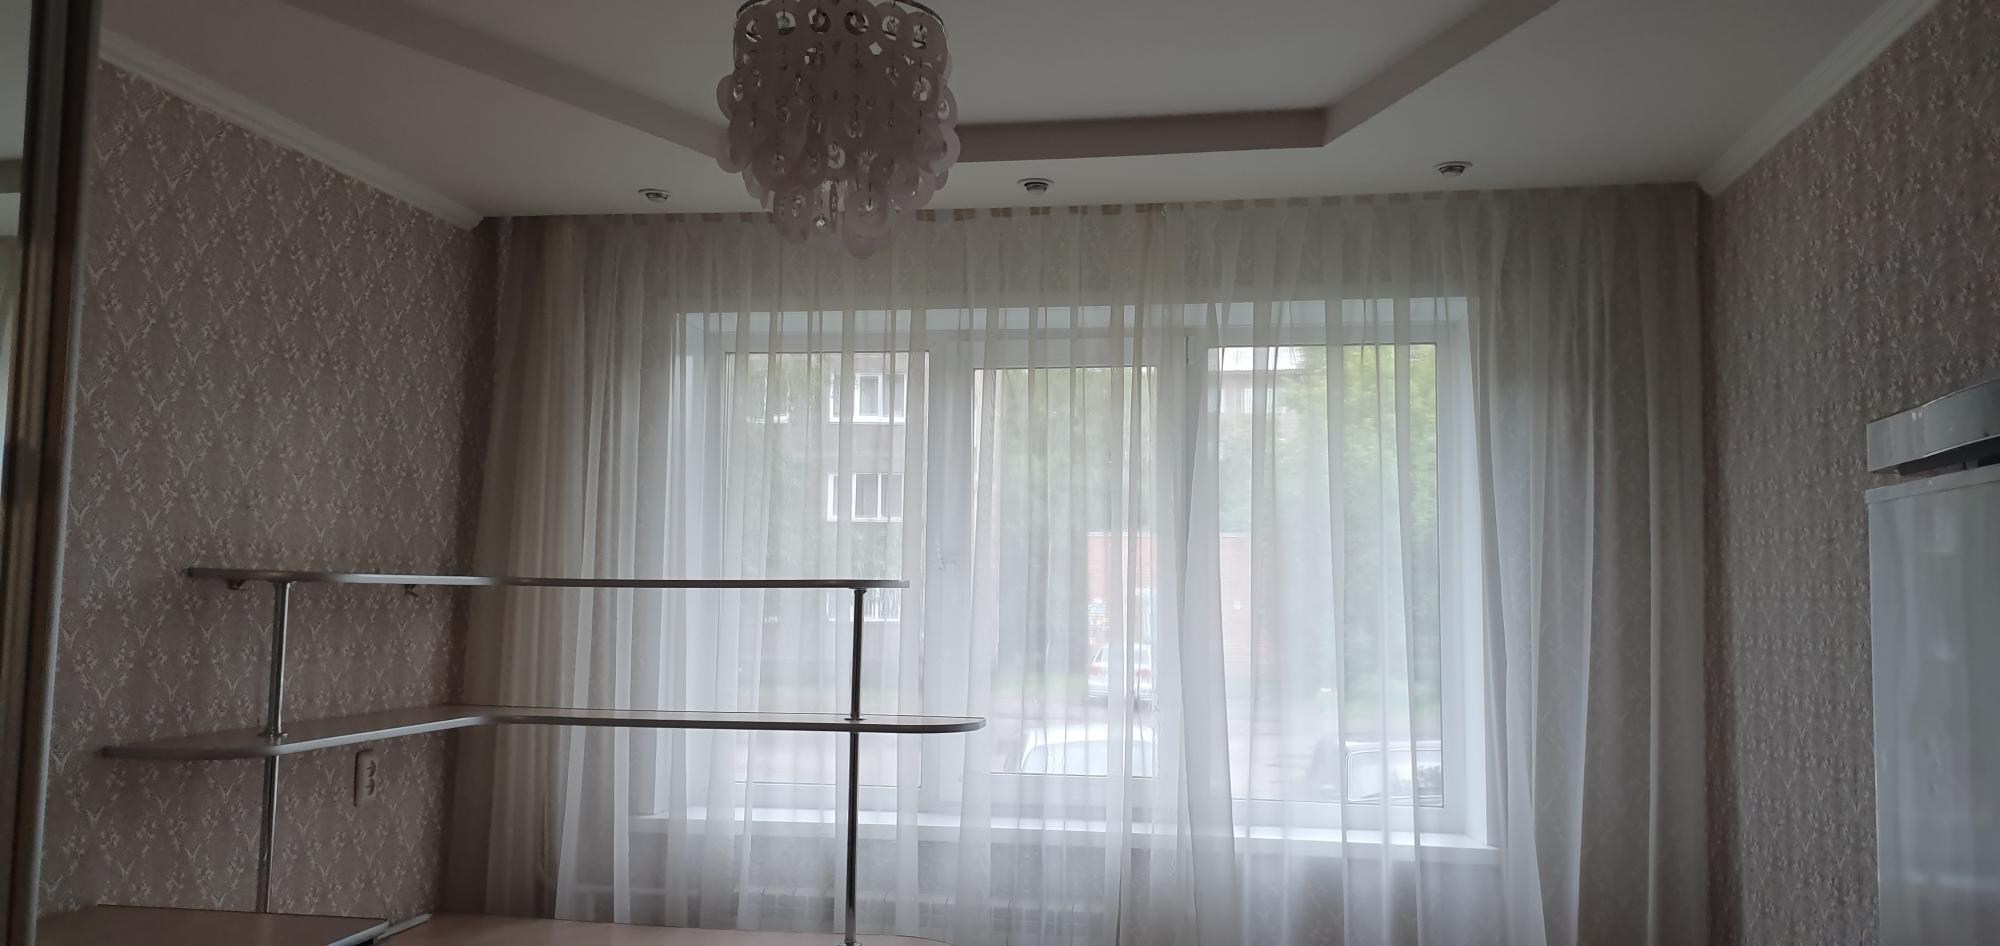 1к квартира улица Семафорная, 259   11000   аренда в Красноярске фото 1